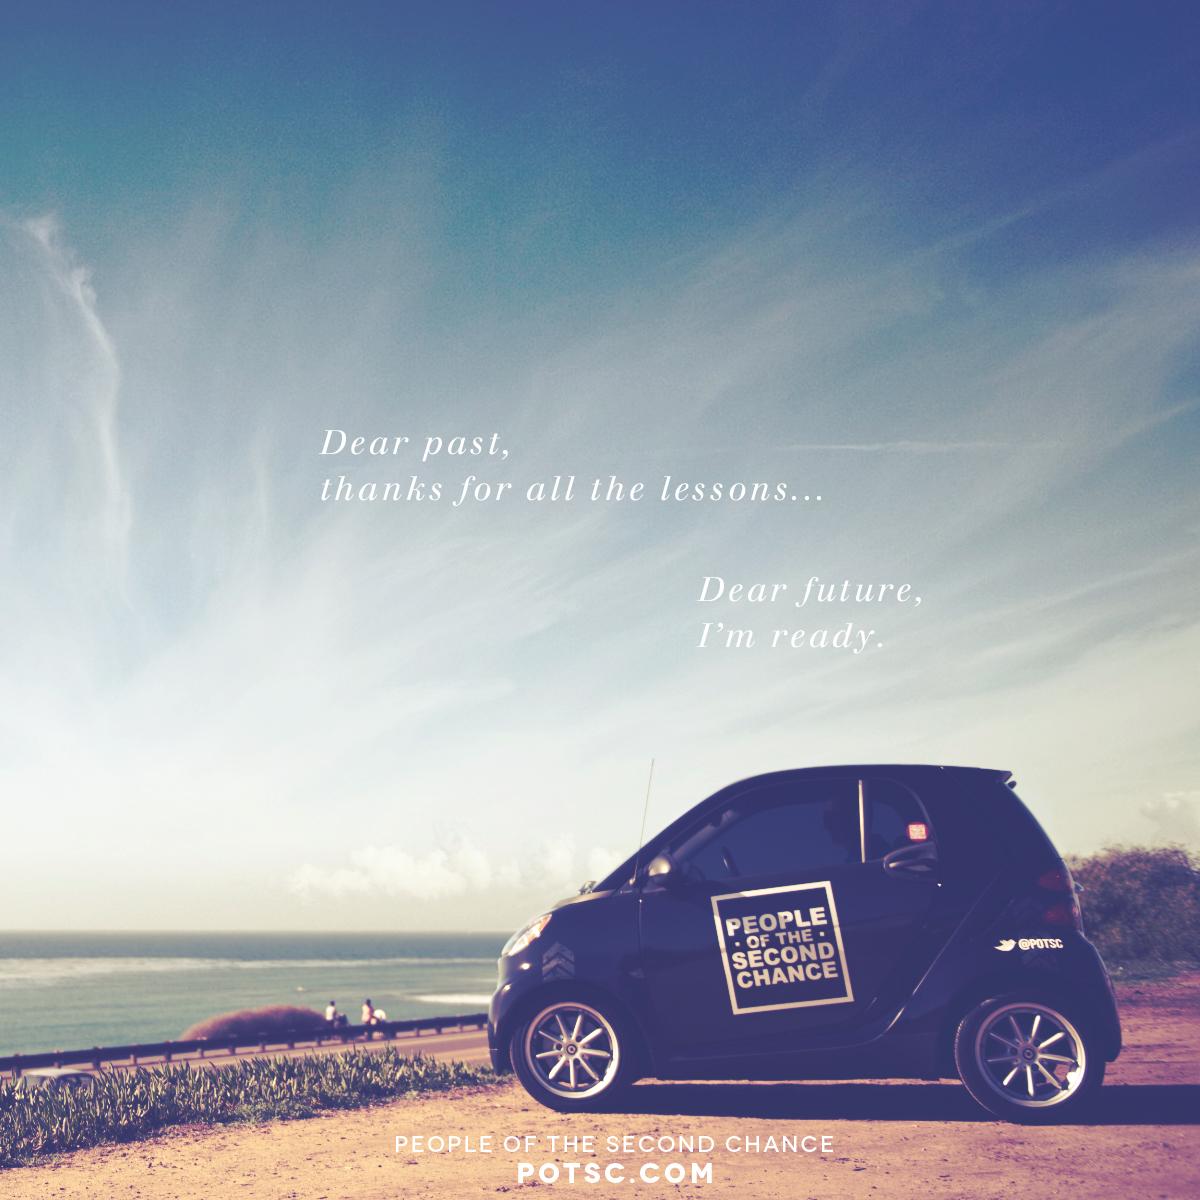 Dear future, I'm ready.     social media promotional image. potsc.com